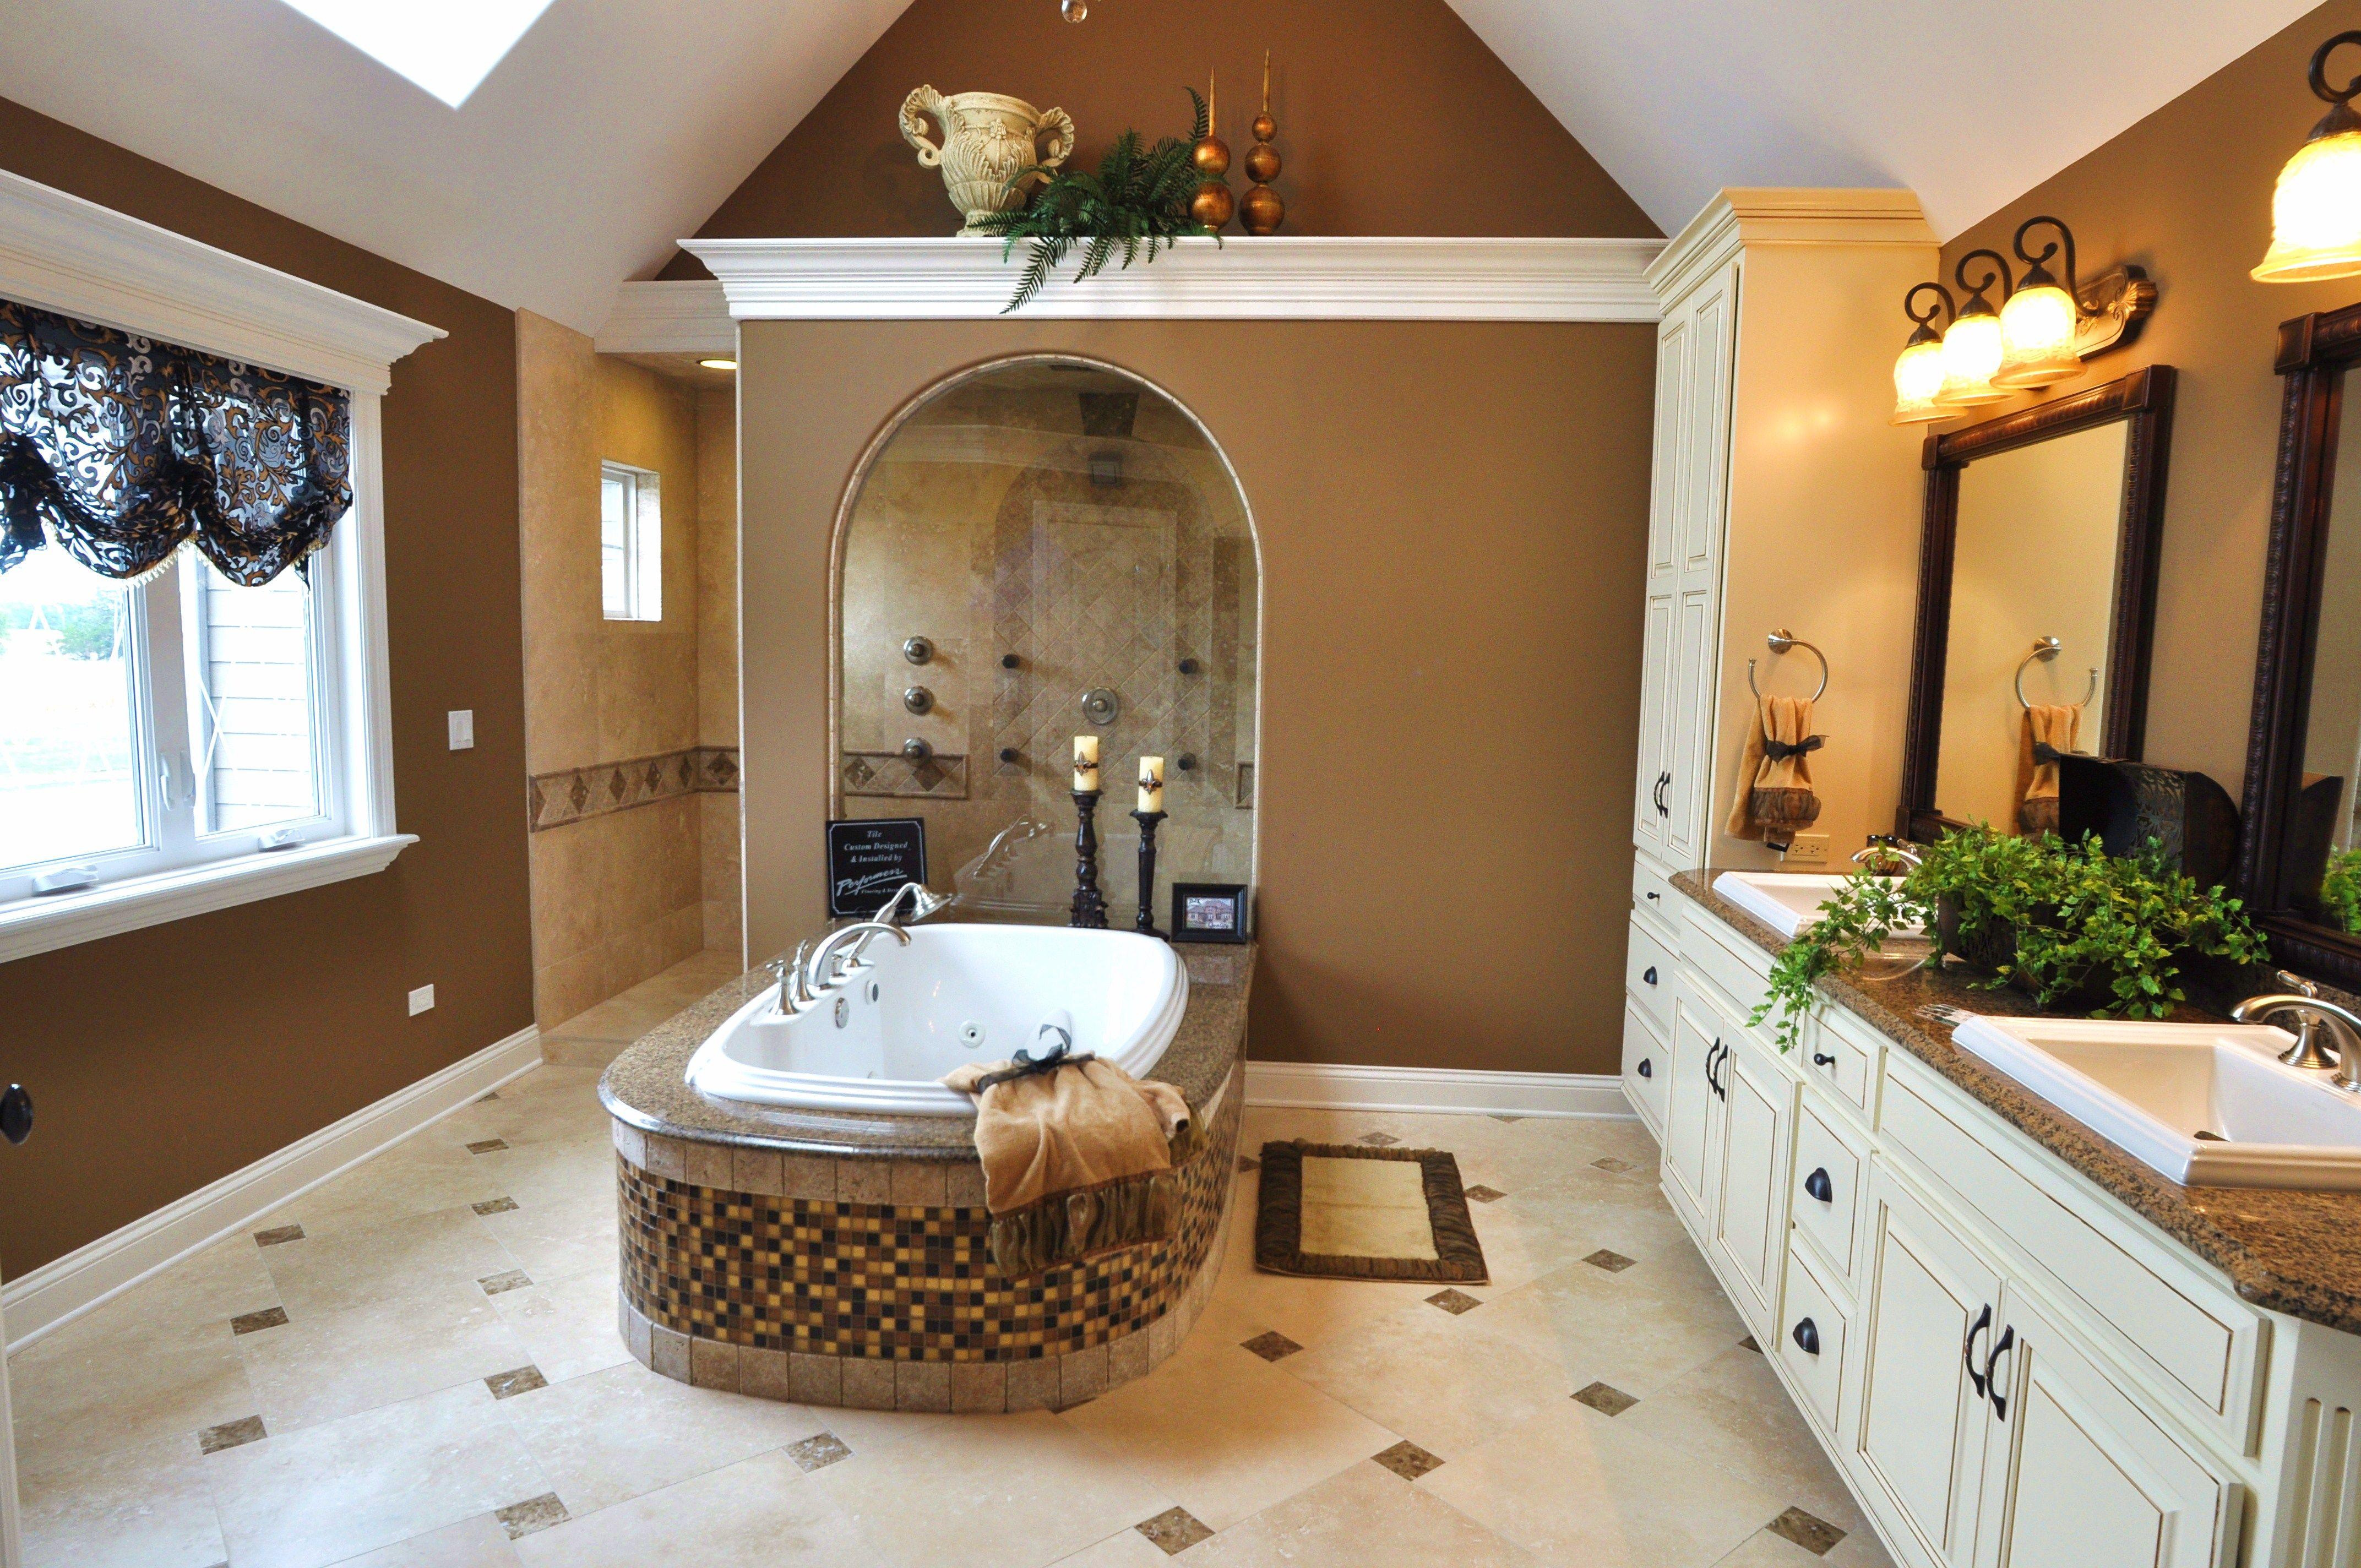 Beautiful Natural Master Bathroom Ideas: Plenty Of Natural Light // Huge Master Bathroom With Rich